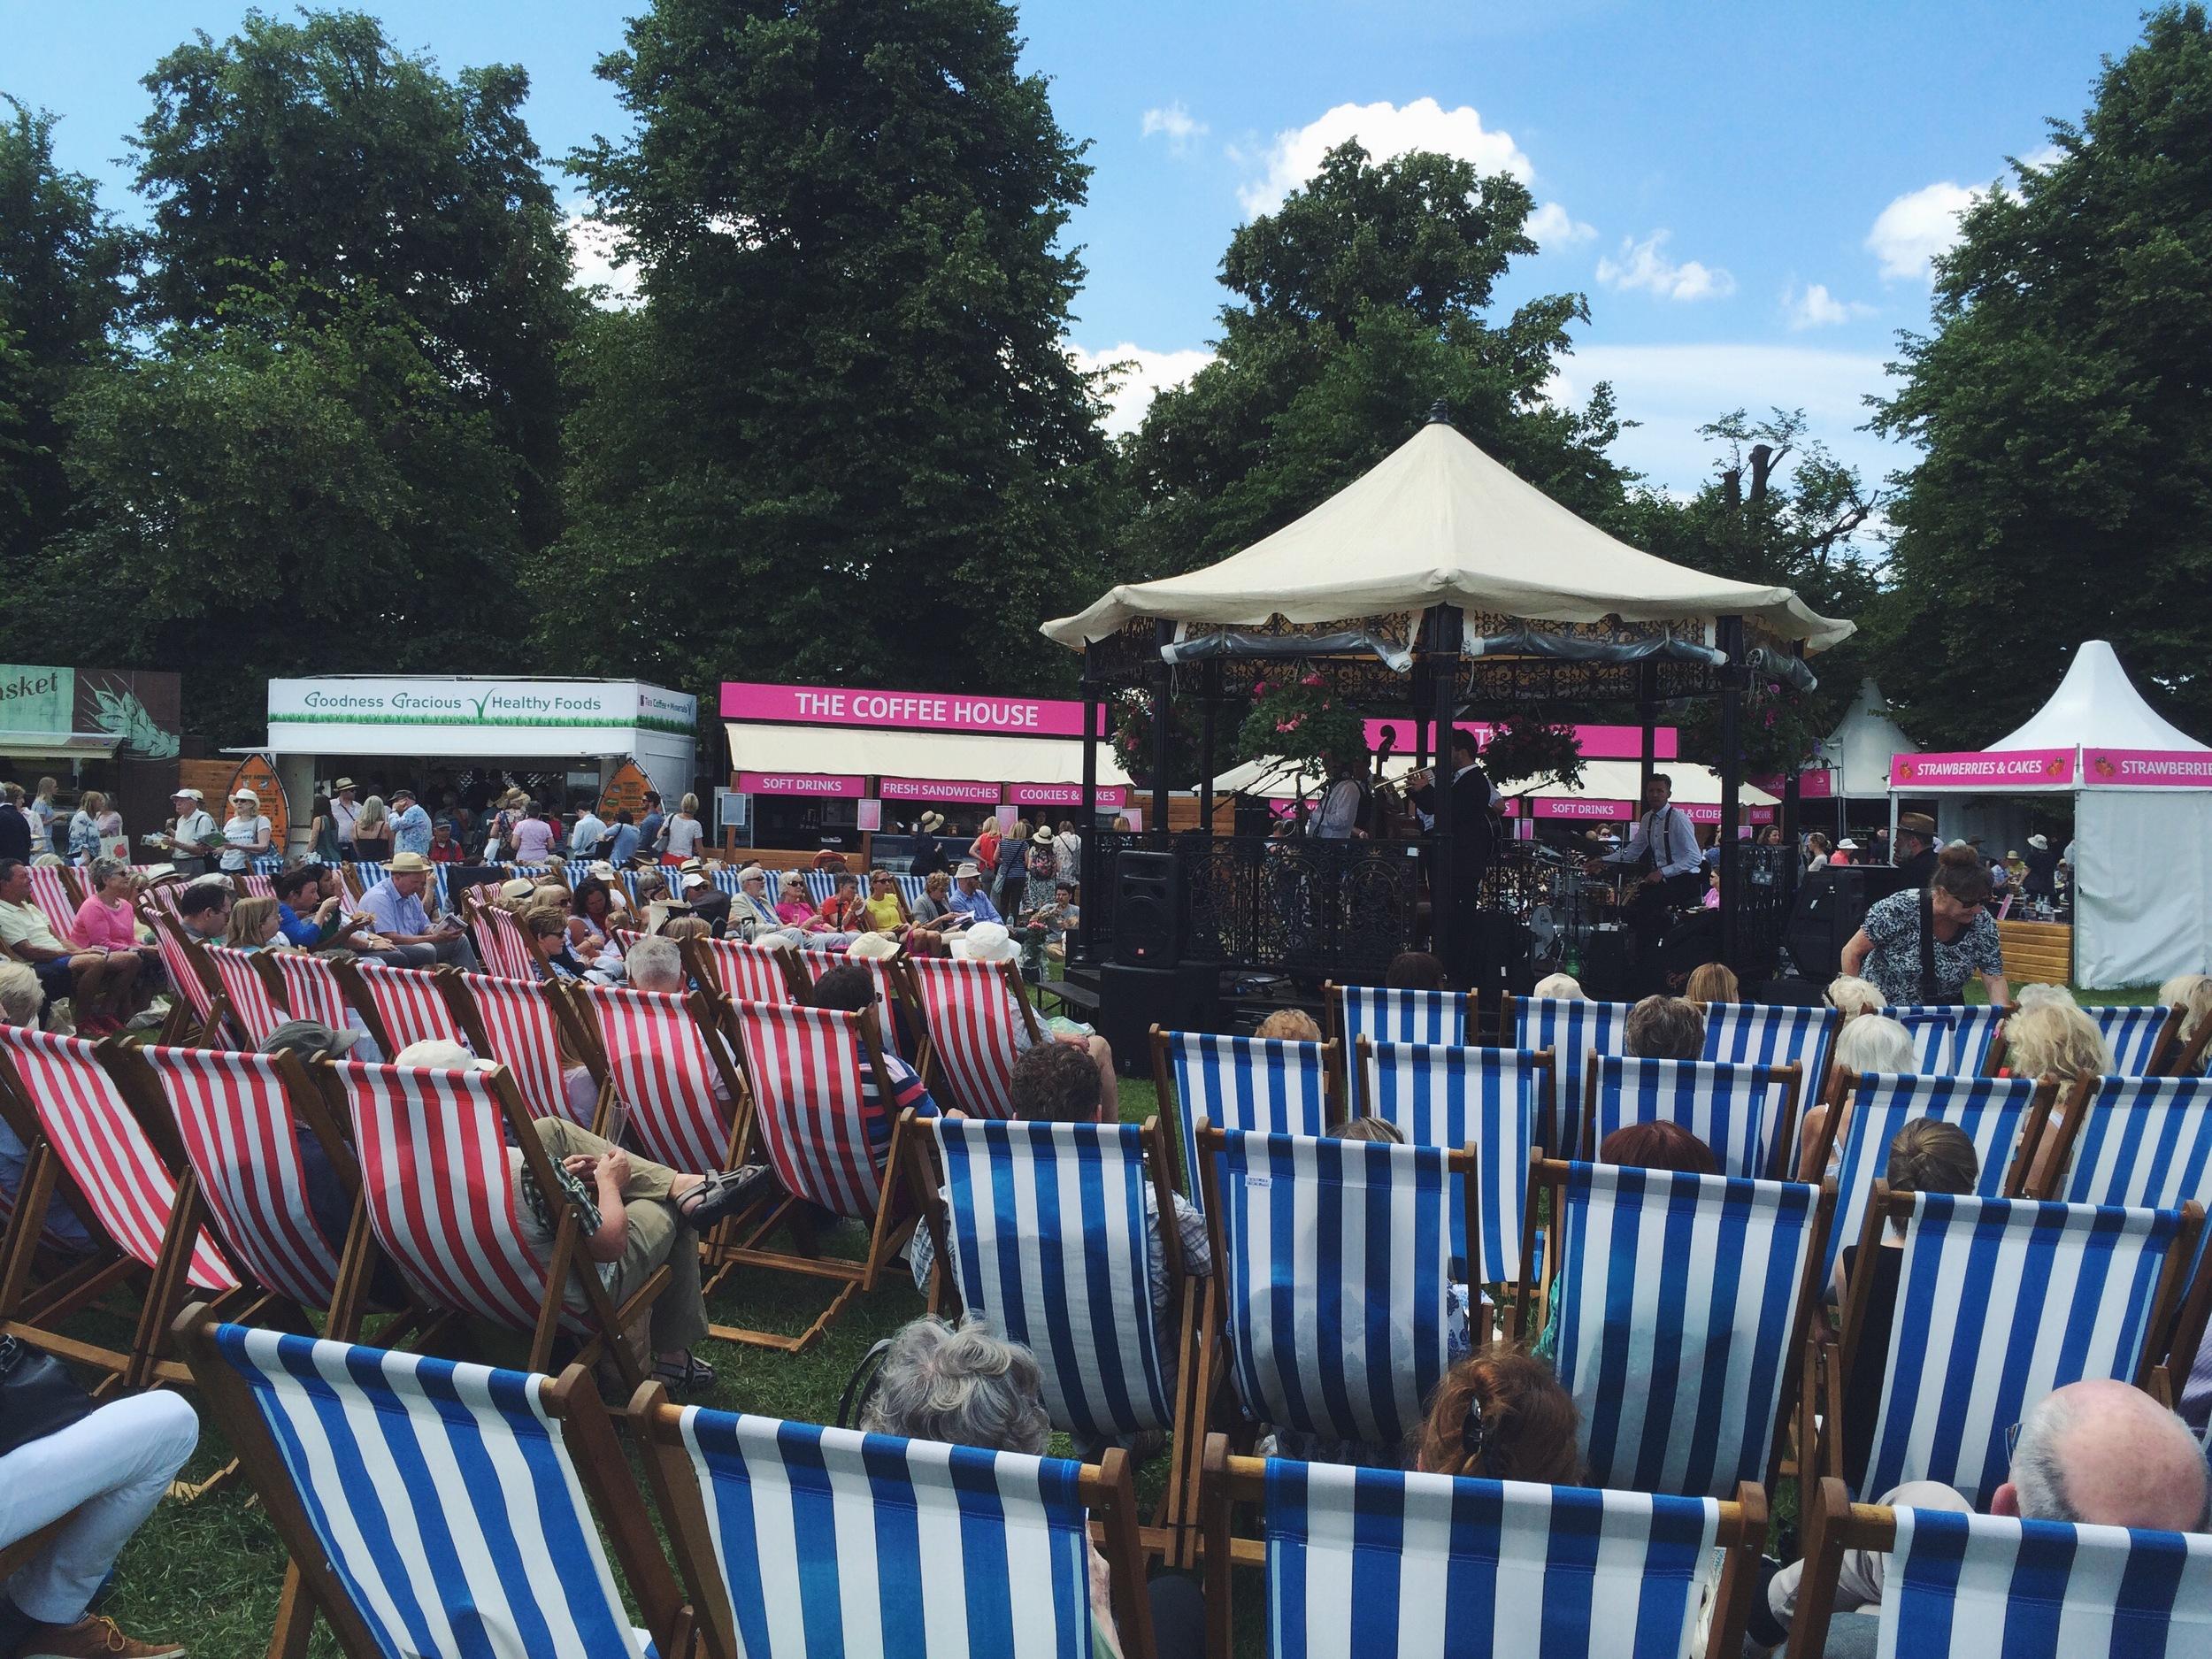 Everyone enjoying the sunshine and good live music